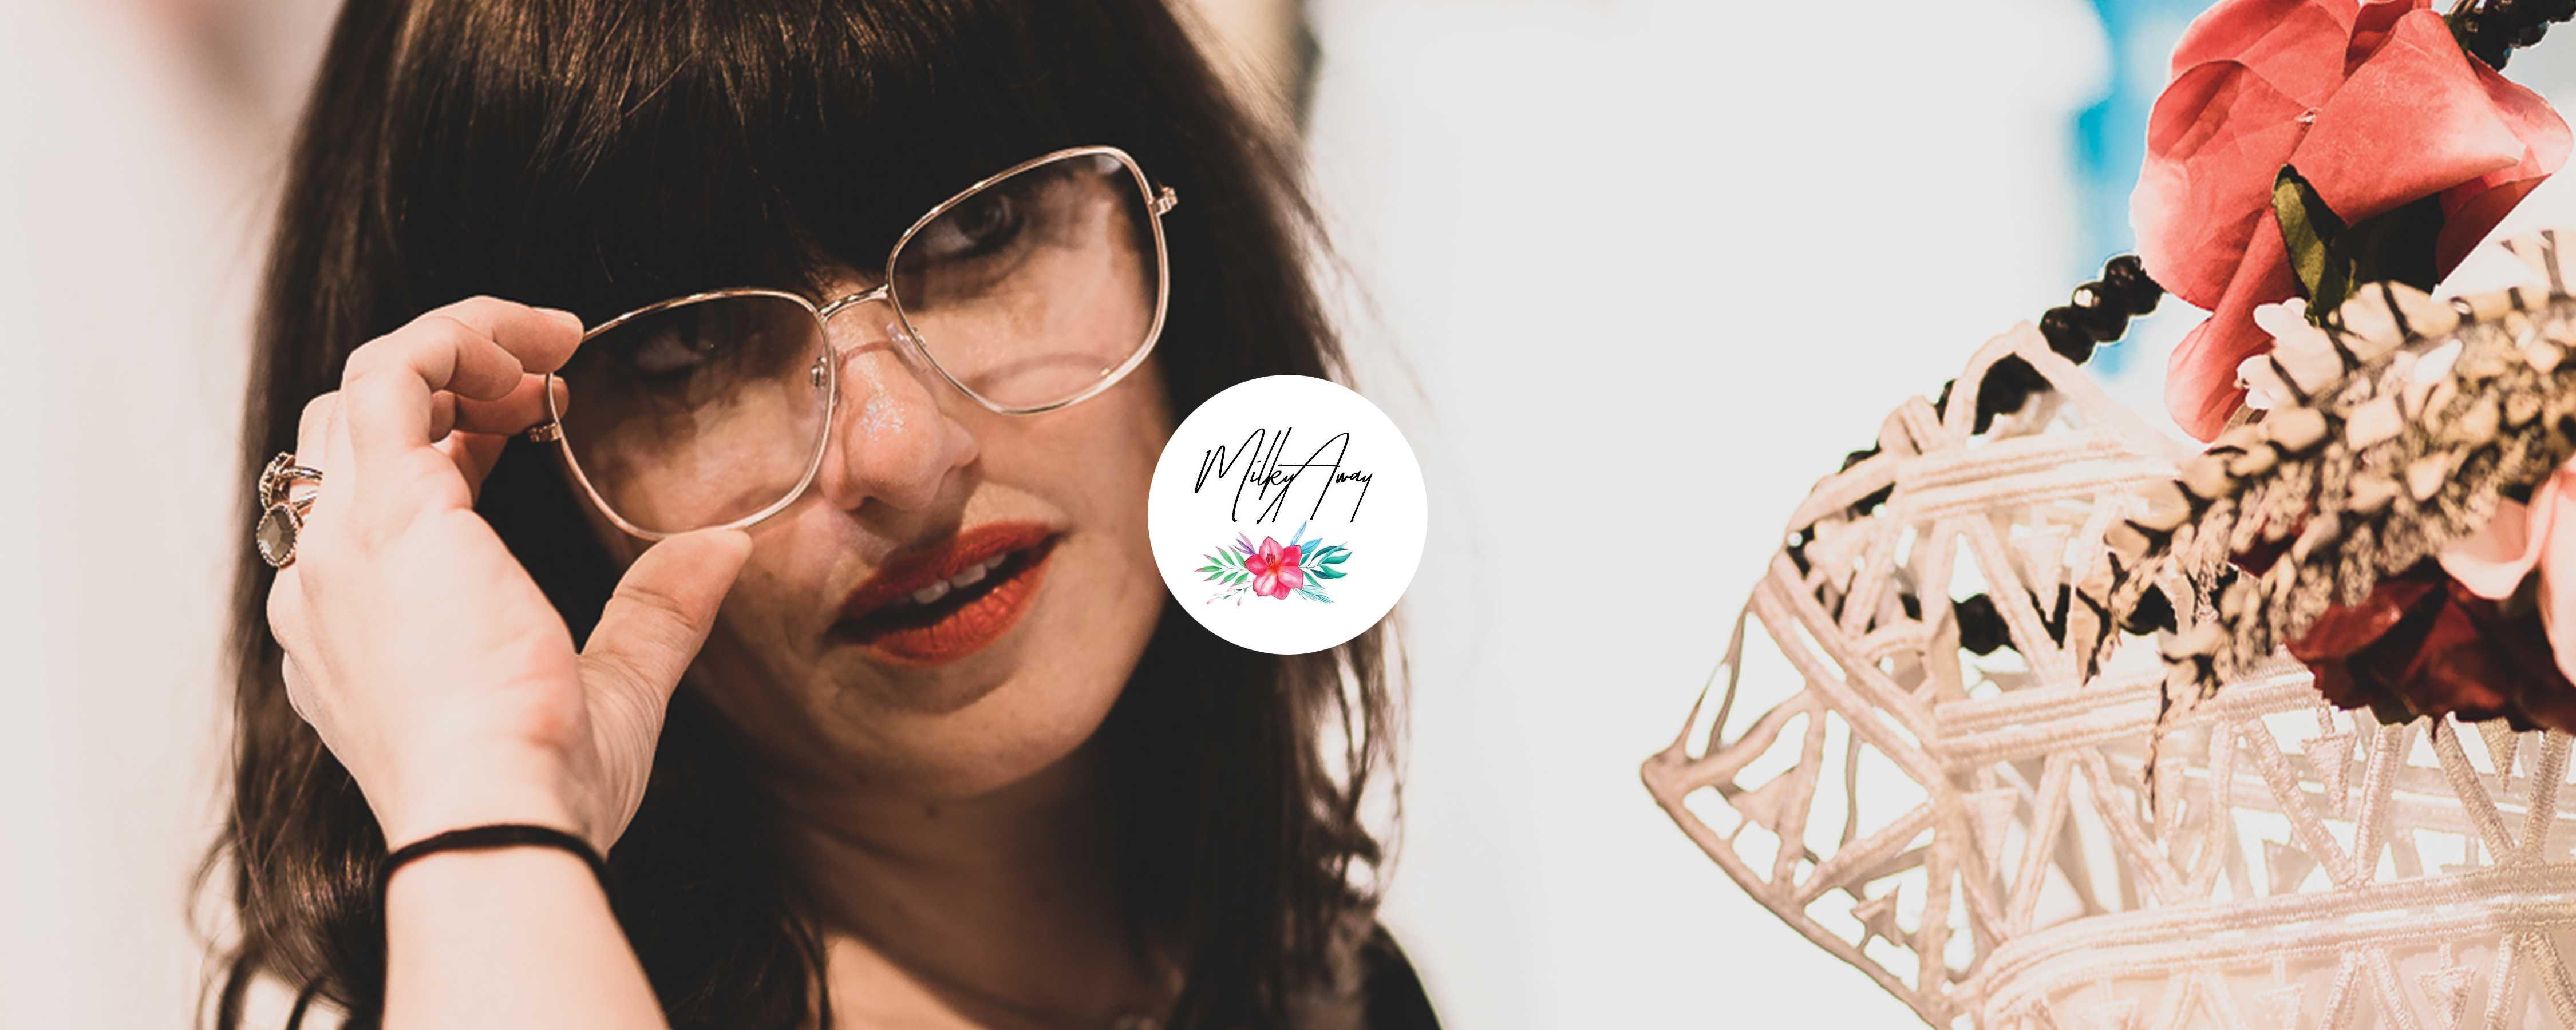 MilkyAway parle de Gisèle & Simone, 20 Oct 2019